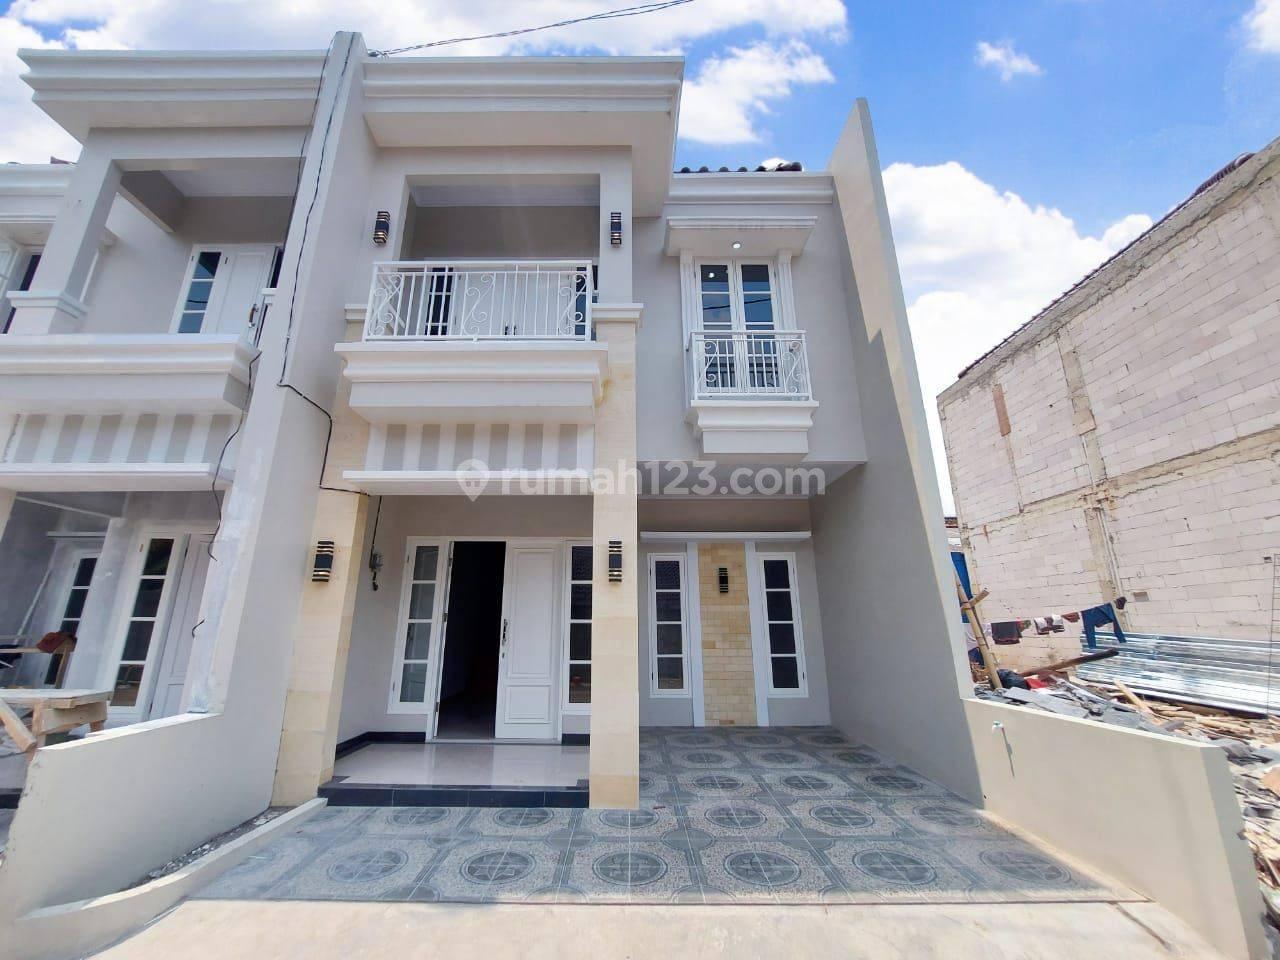 Rumah baru minimalis tinggal masuk lokasi setrategis di Jagakarsa jakarta selatan